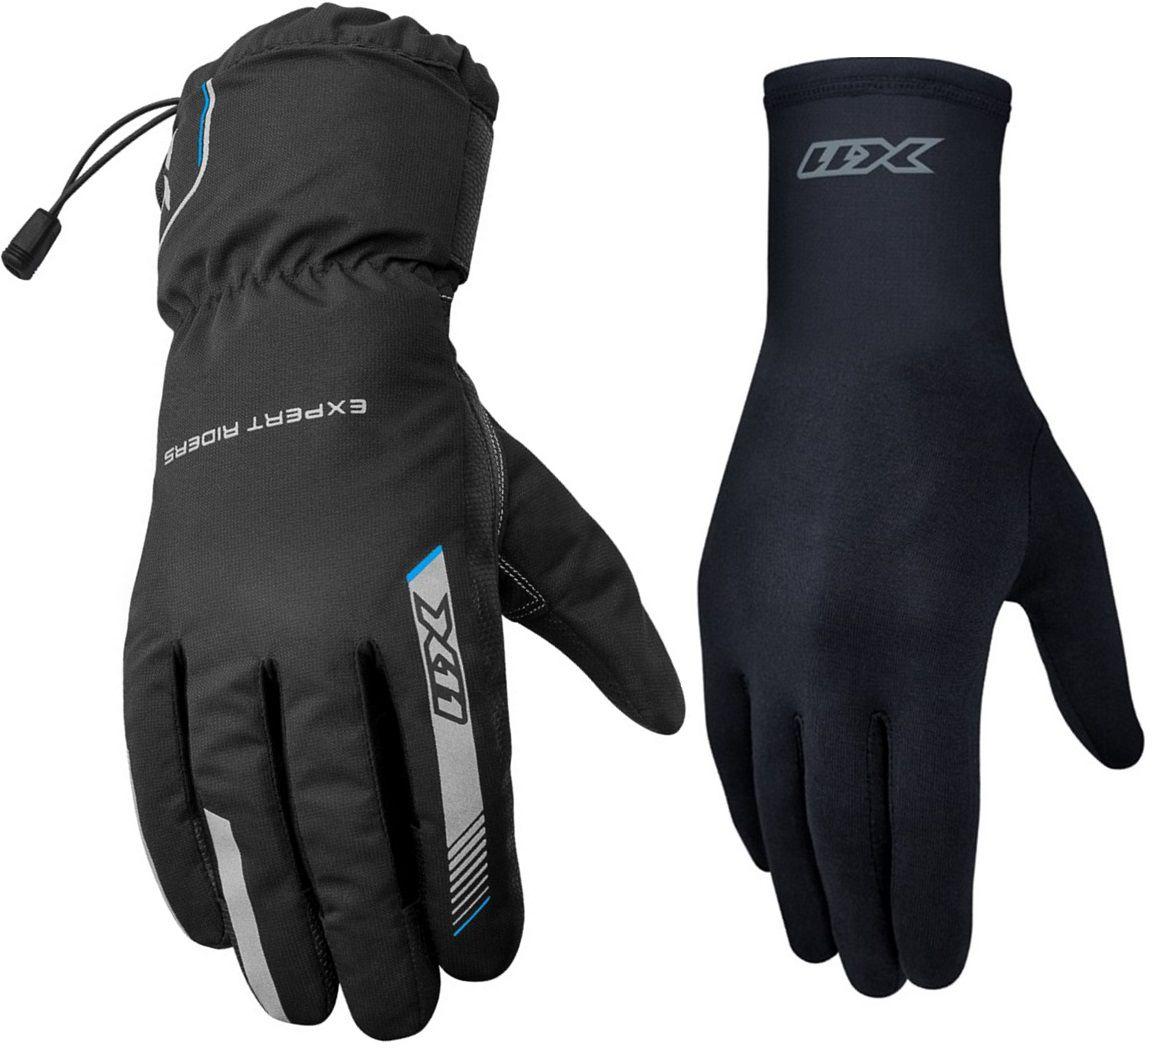 Kit Luva X11 Proof Impermeável + Luva X11 Thermic Segunda Pele 3b205bb4f09ce